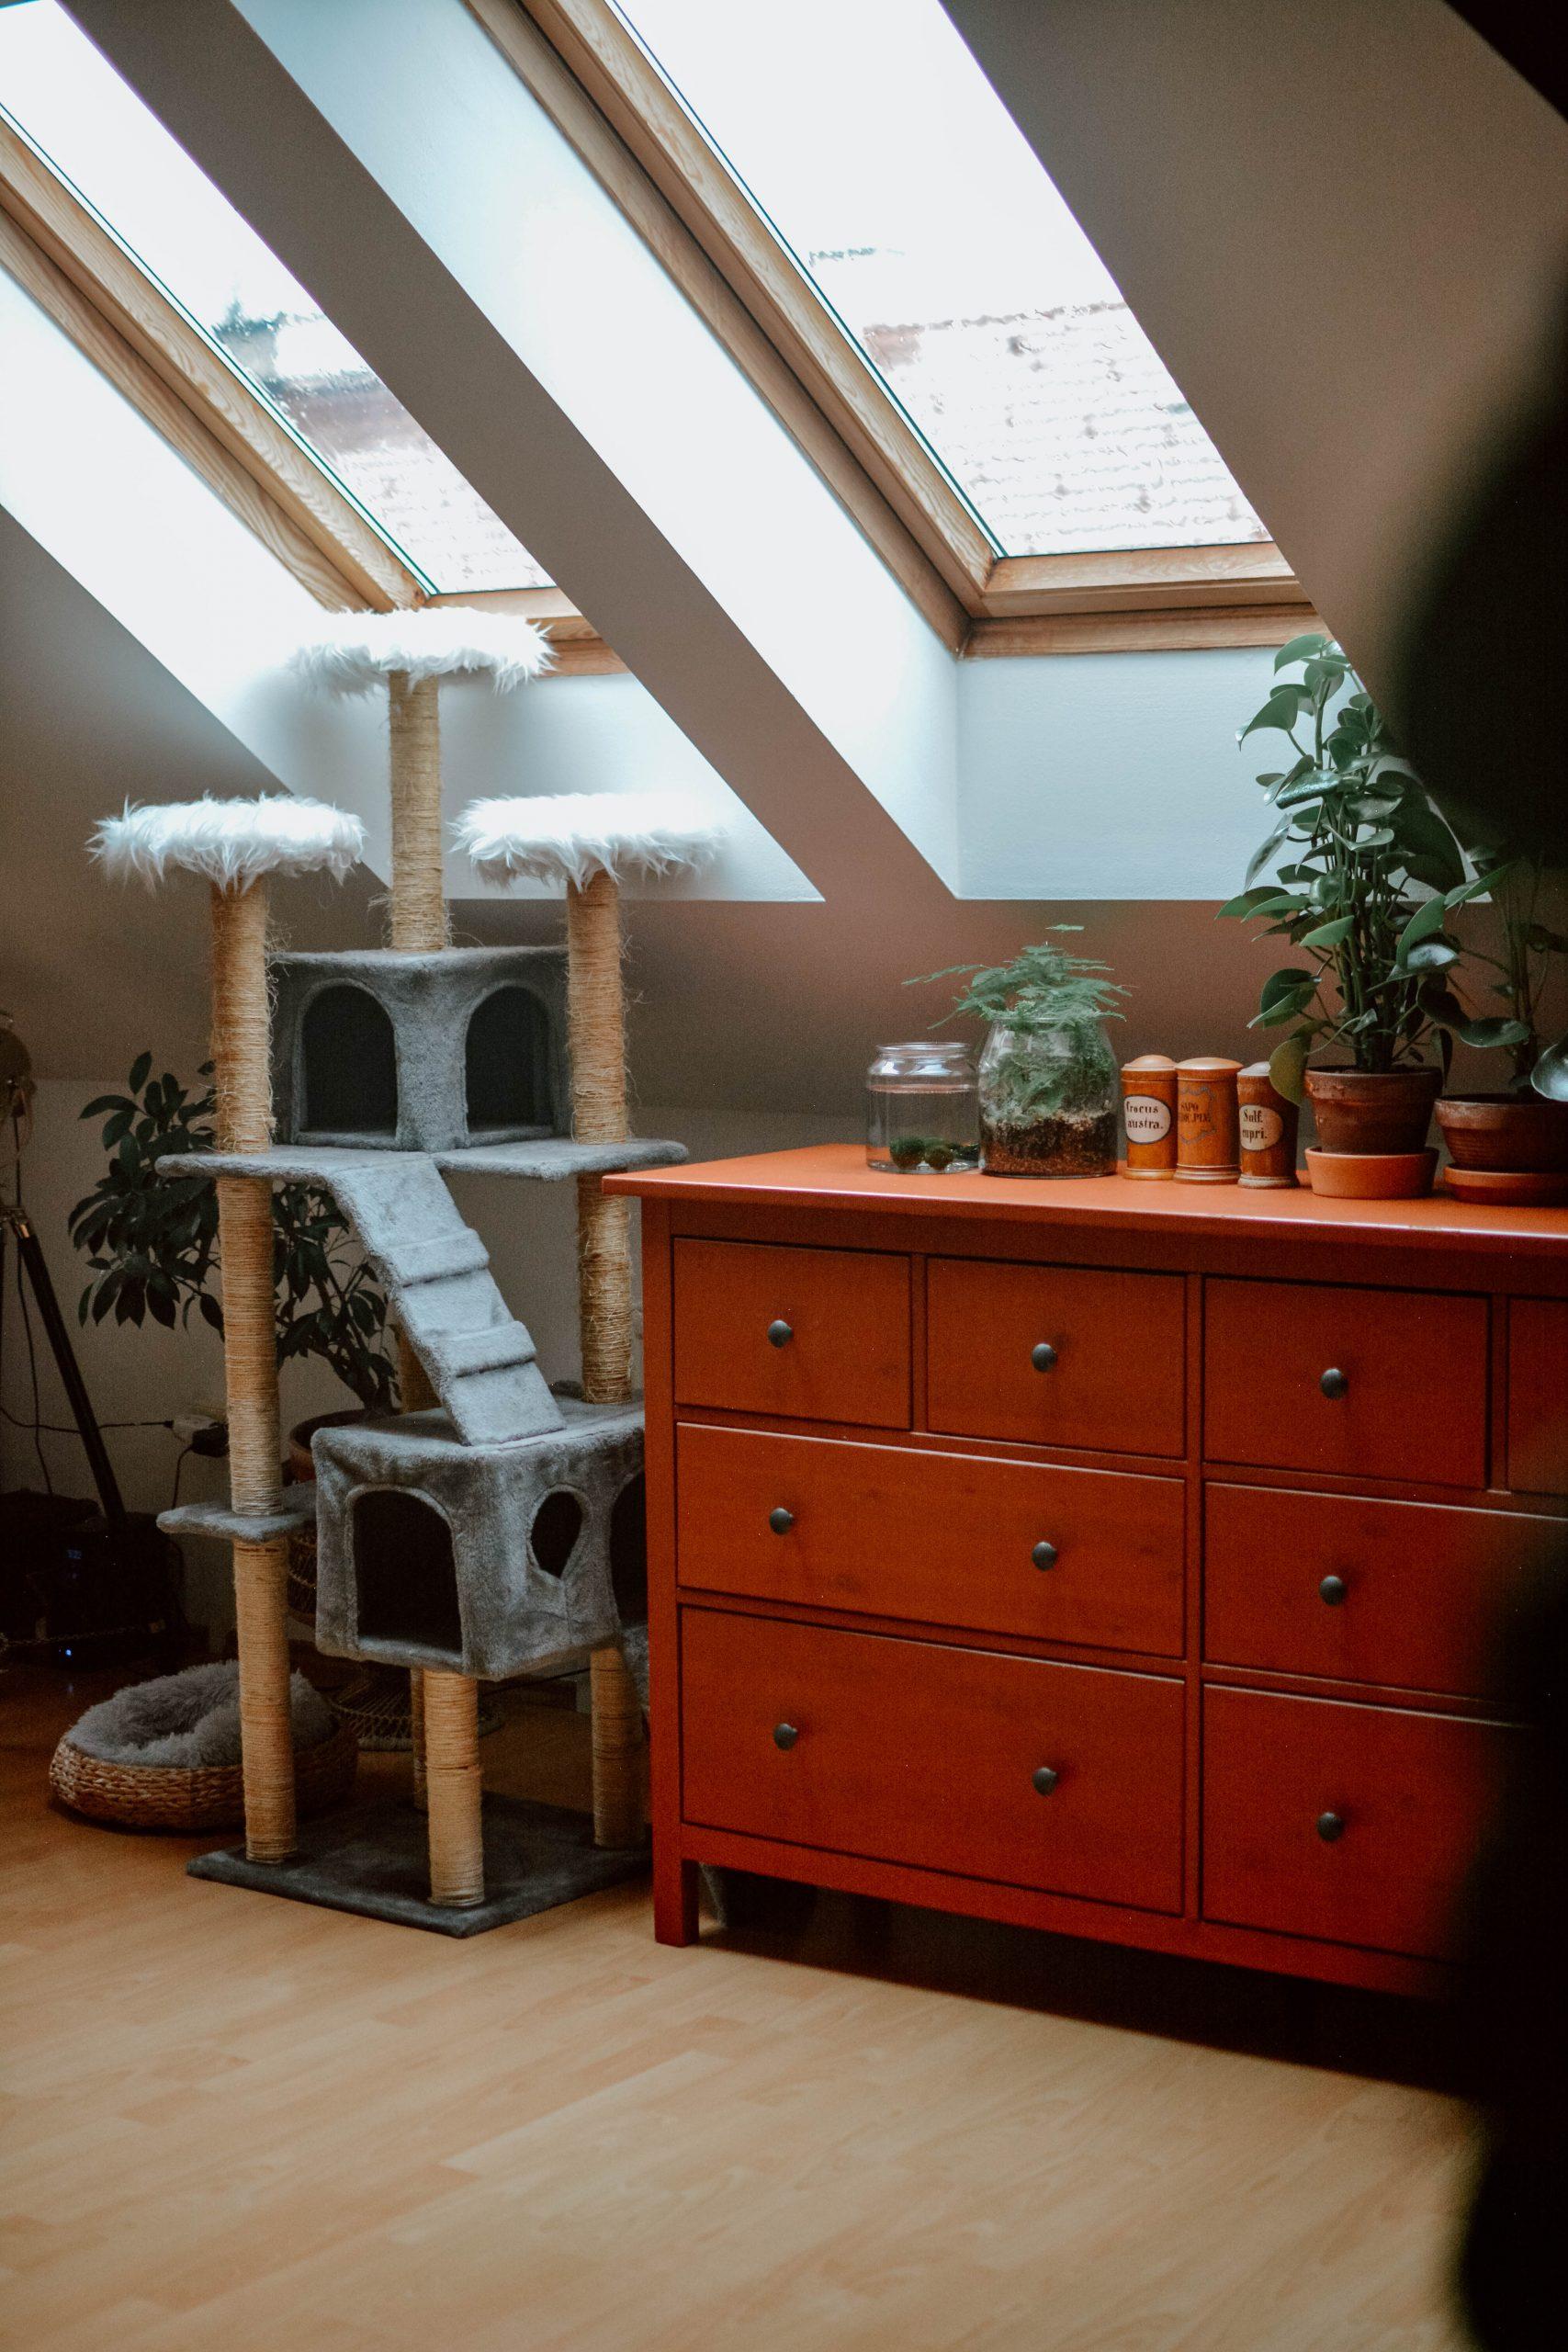 Repair instead of rebuy: Cat scratch tower